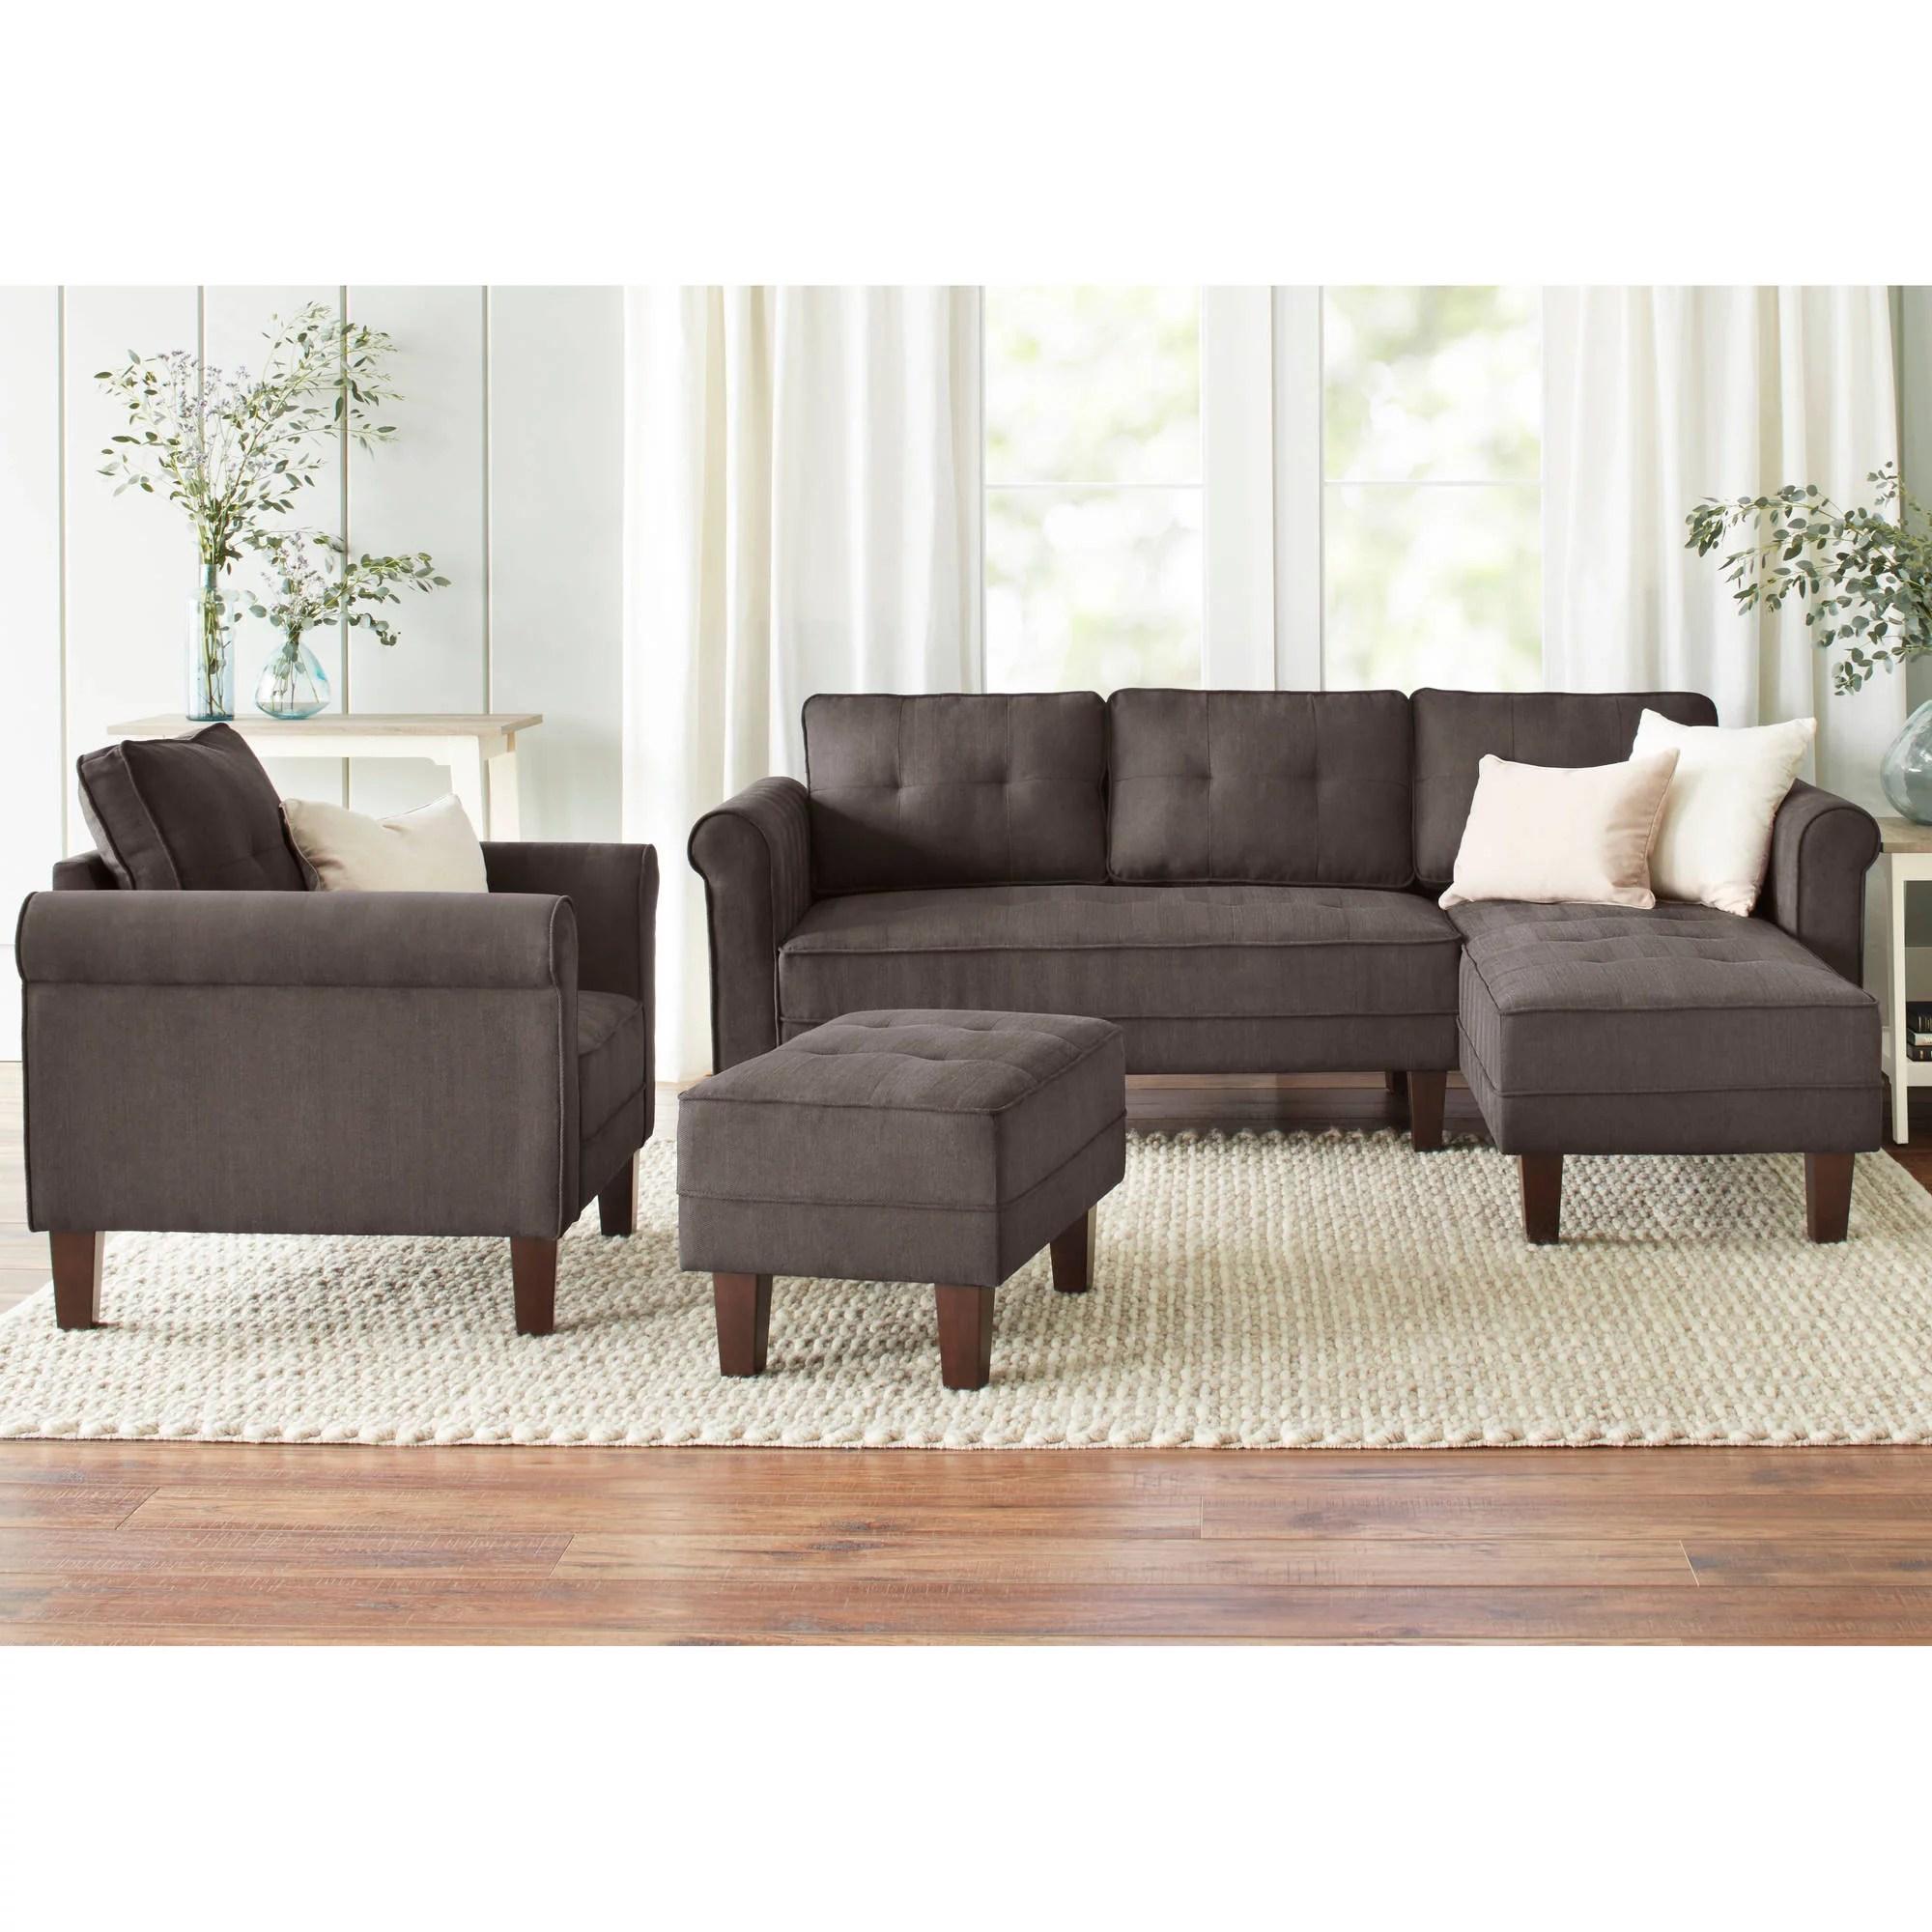 chelsea sofa st albans sofas for less uk ashton product thesofa